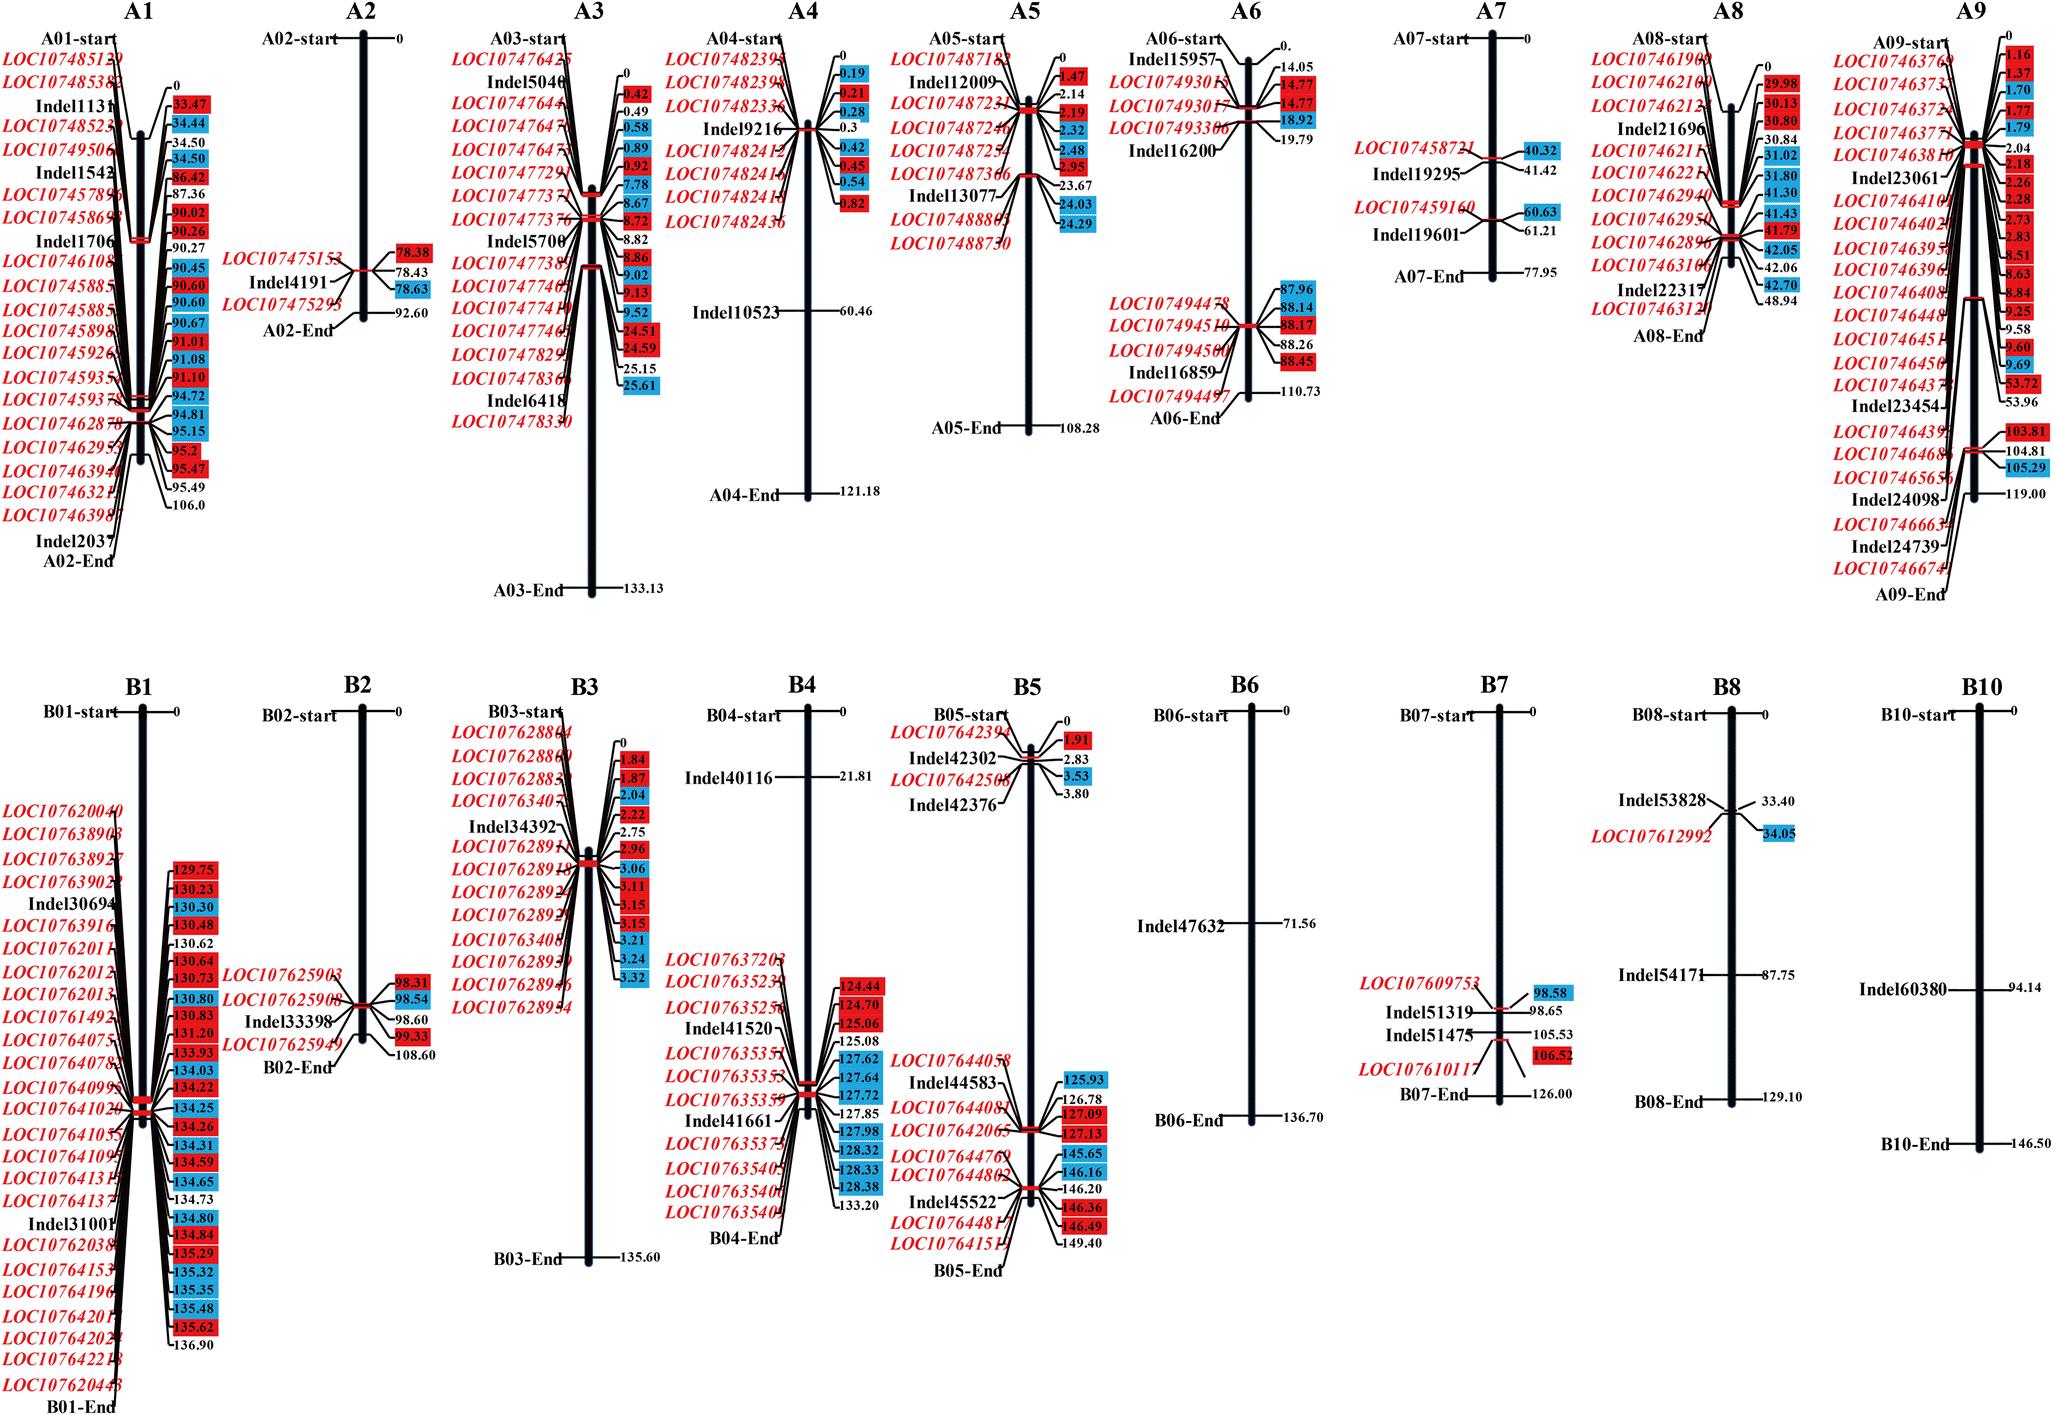 Genomic and Transcriptomic Analysis Identified Gene Clusters